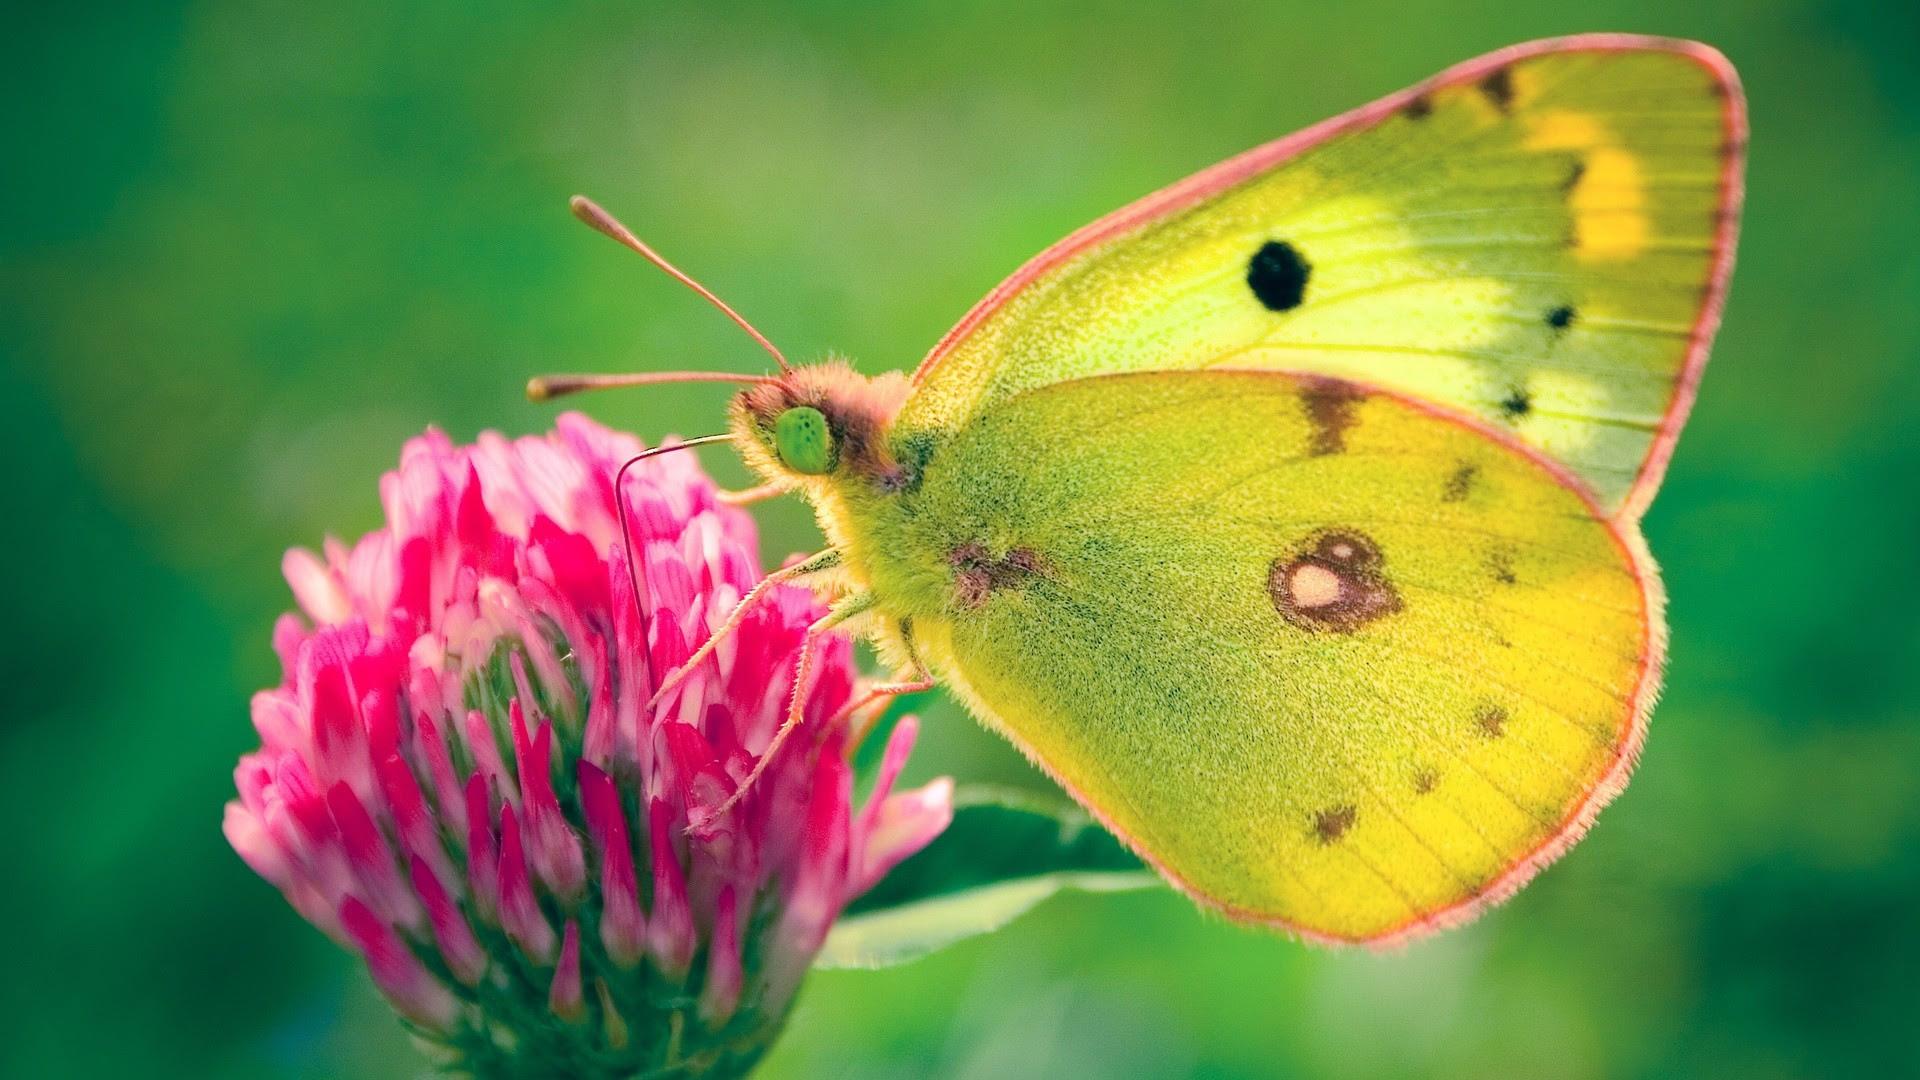 Butterfly Desktop Backgrounds (52+ images)